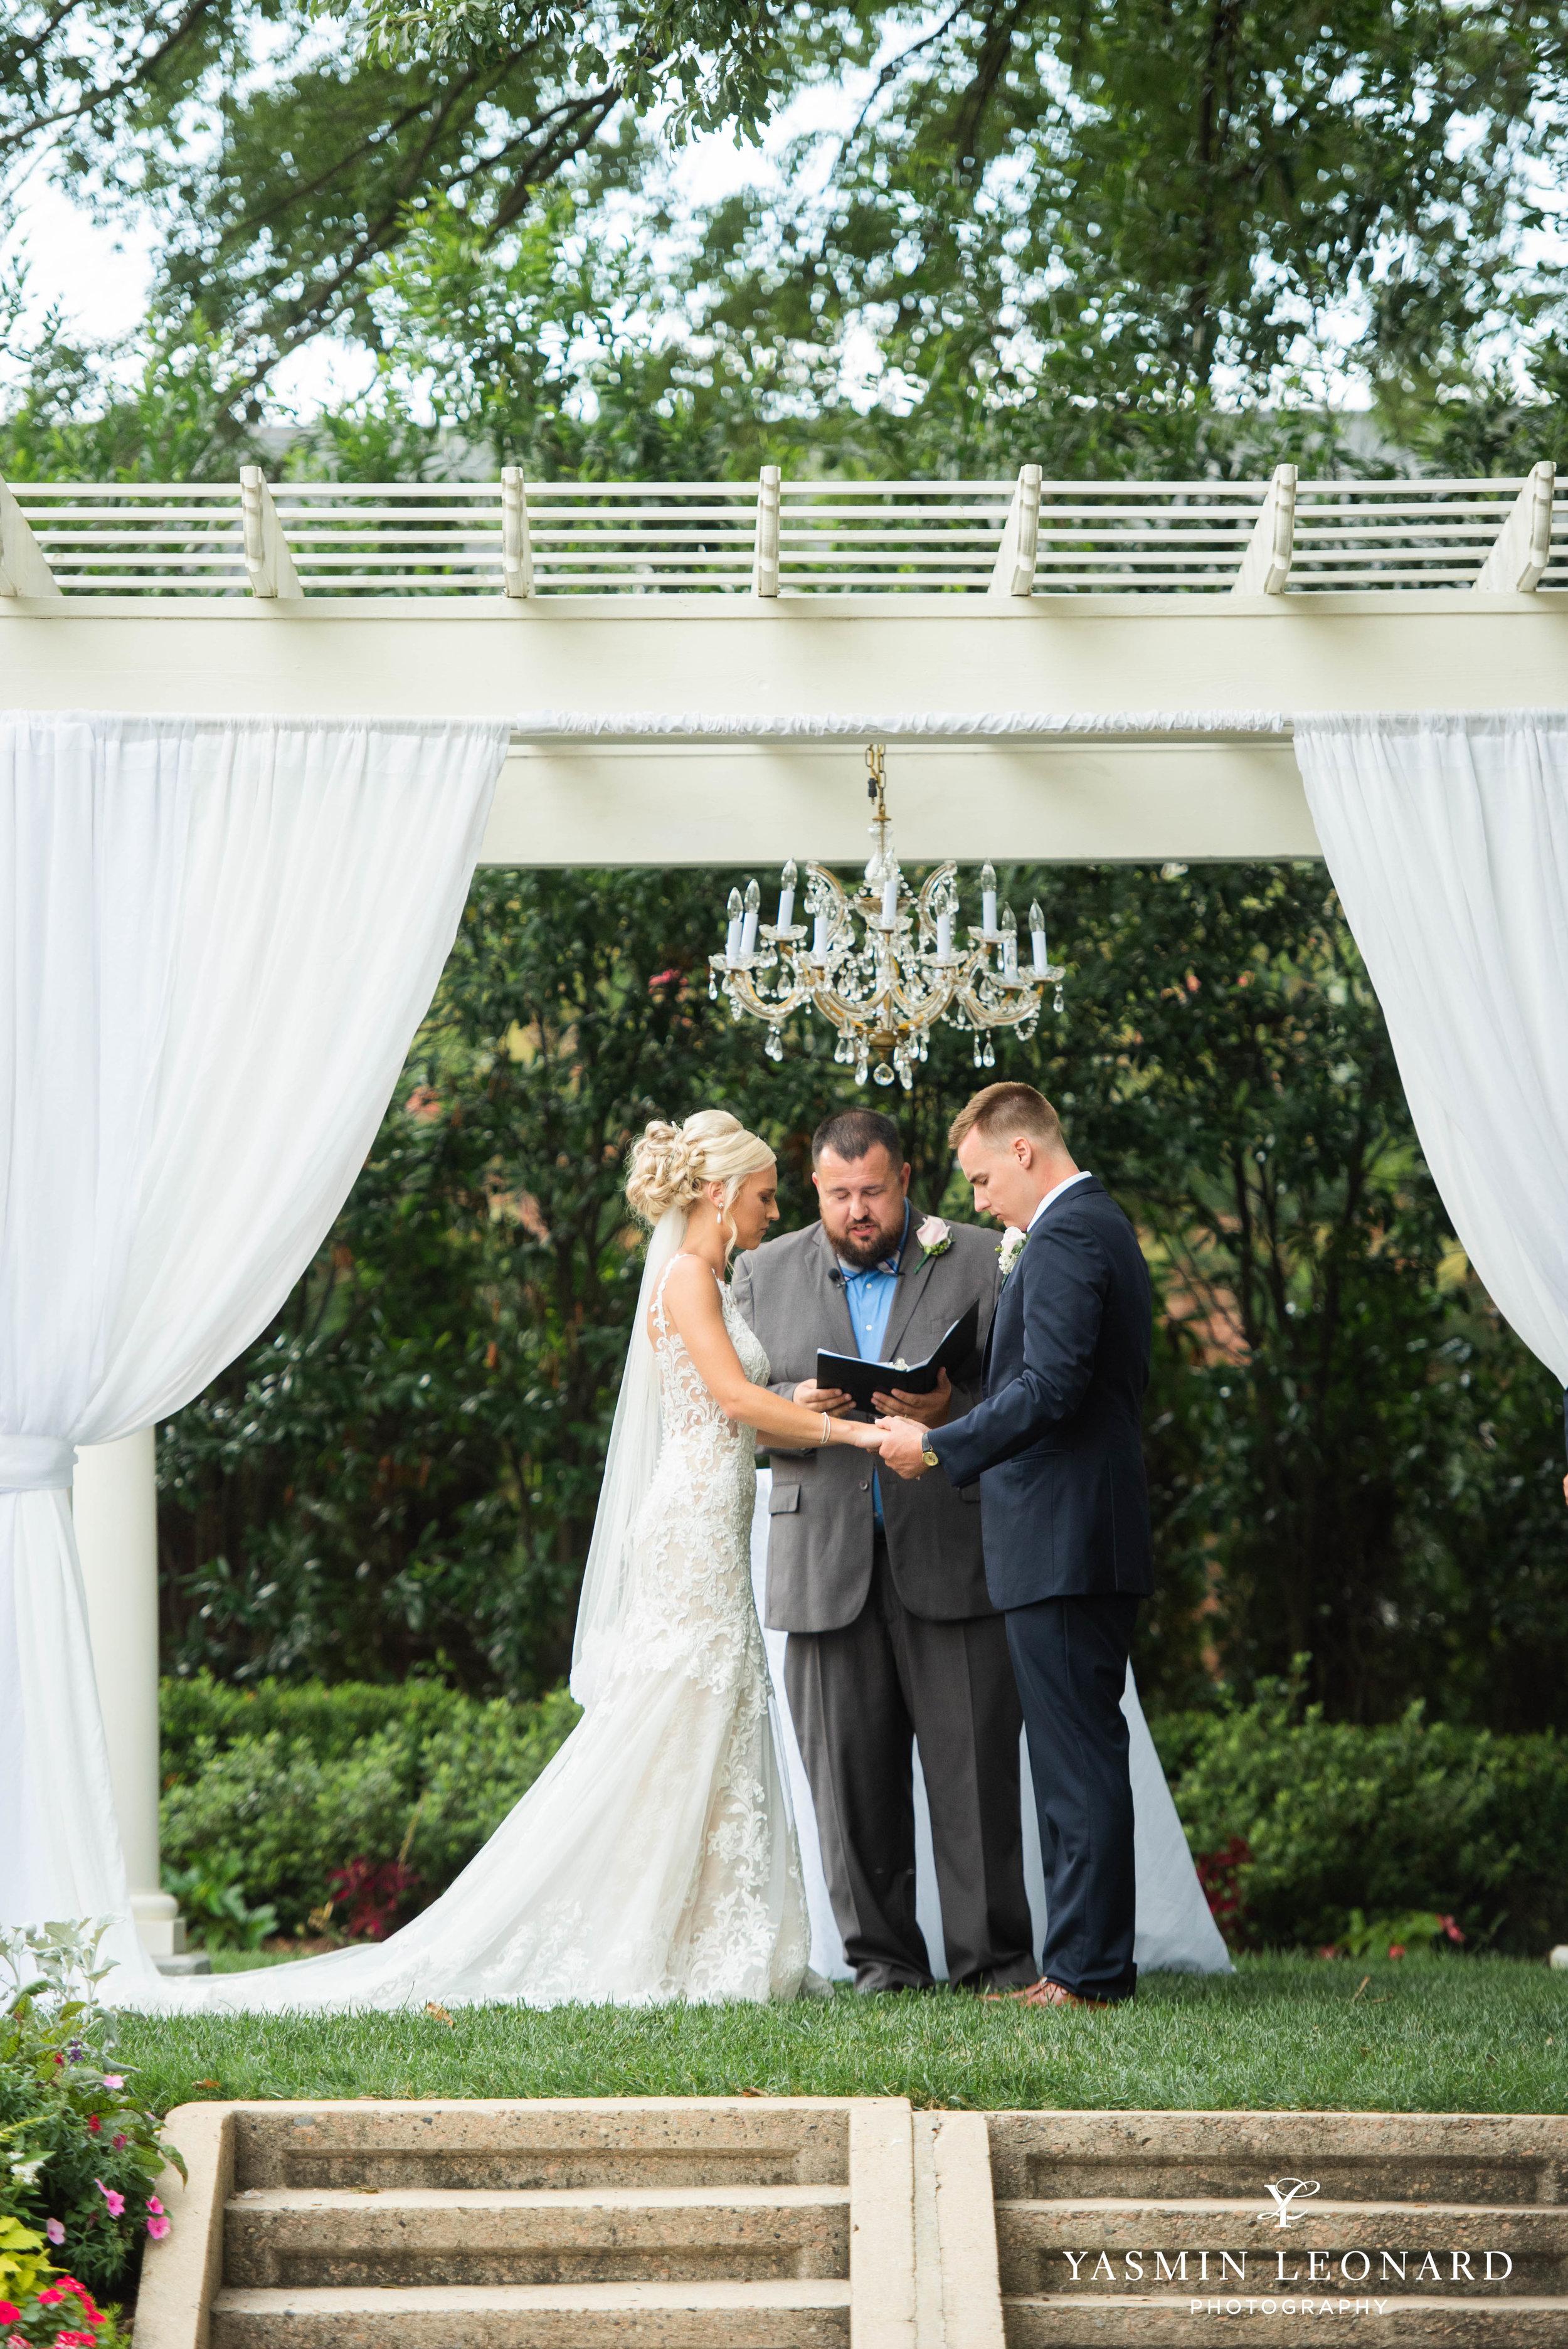 Separk Mansion - NC Weddings - Gastonia Wedding - NC Wedding Venues - Pink and Blue Wedding Ideas - Pink Bridesmaid Dresses - Yasmin Leonard Photography-22.jpg